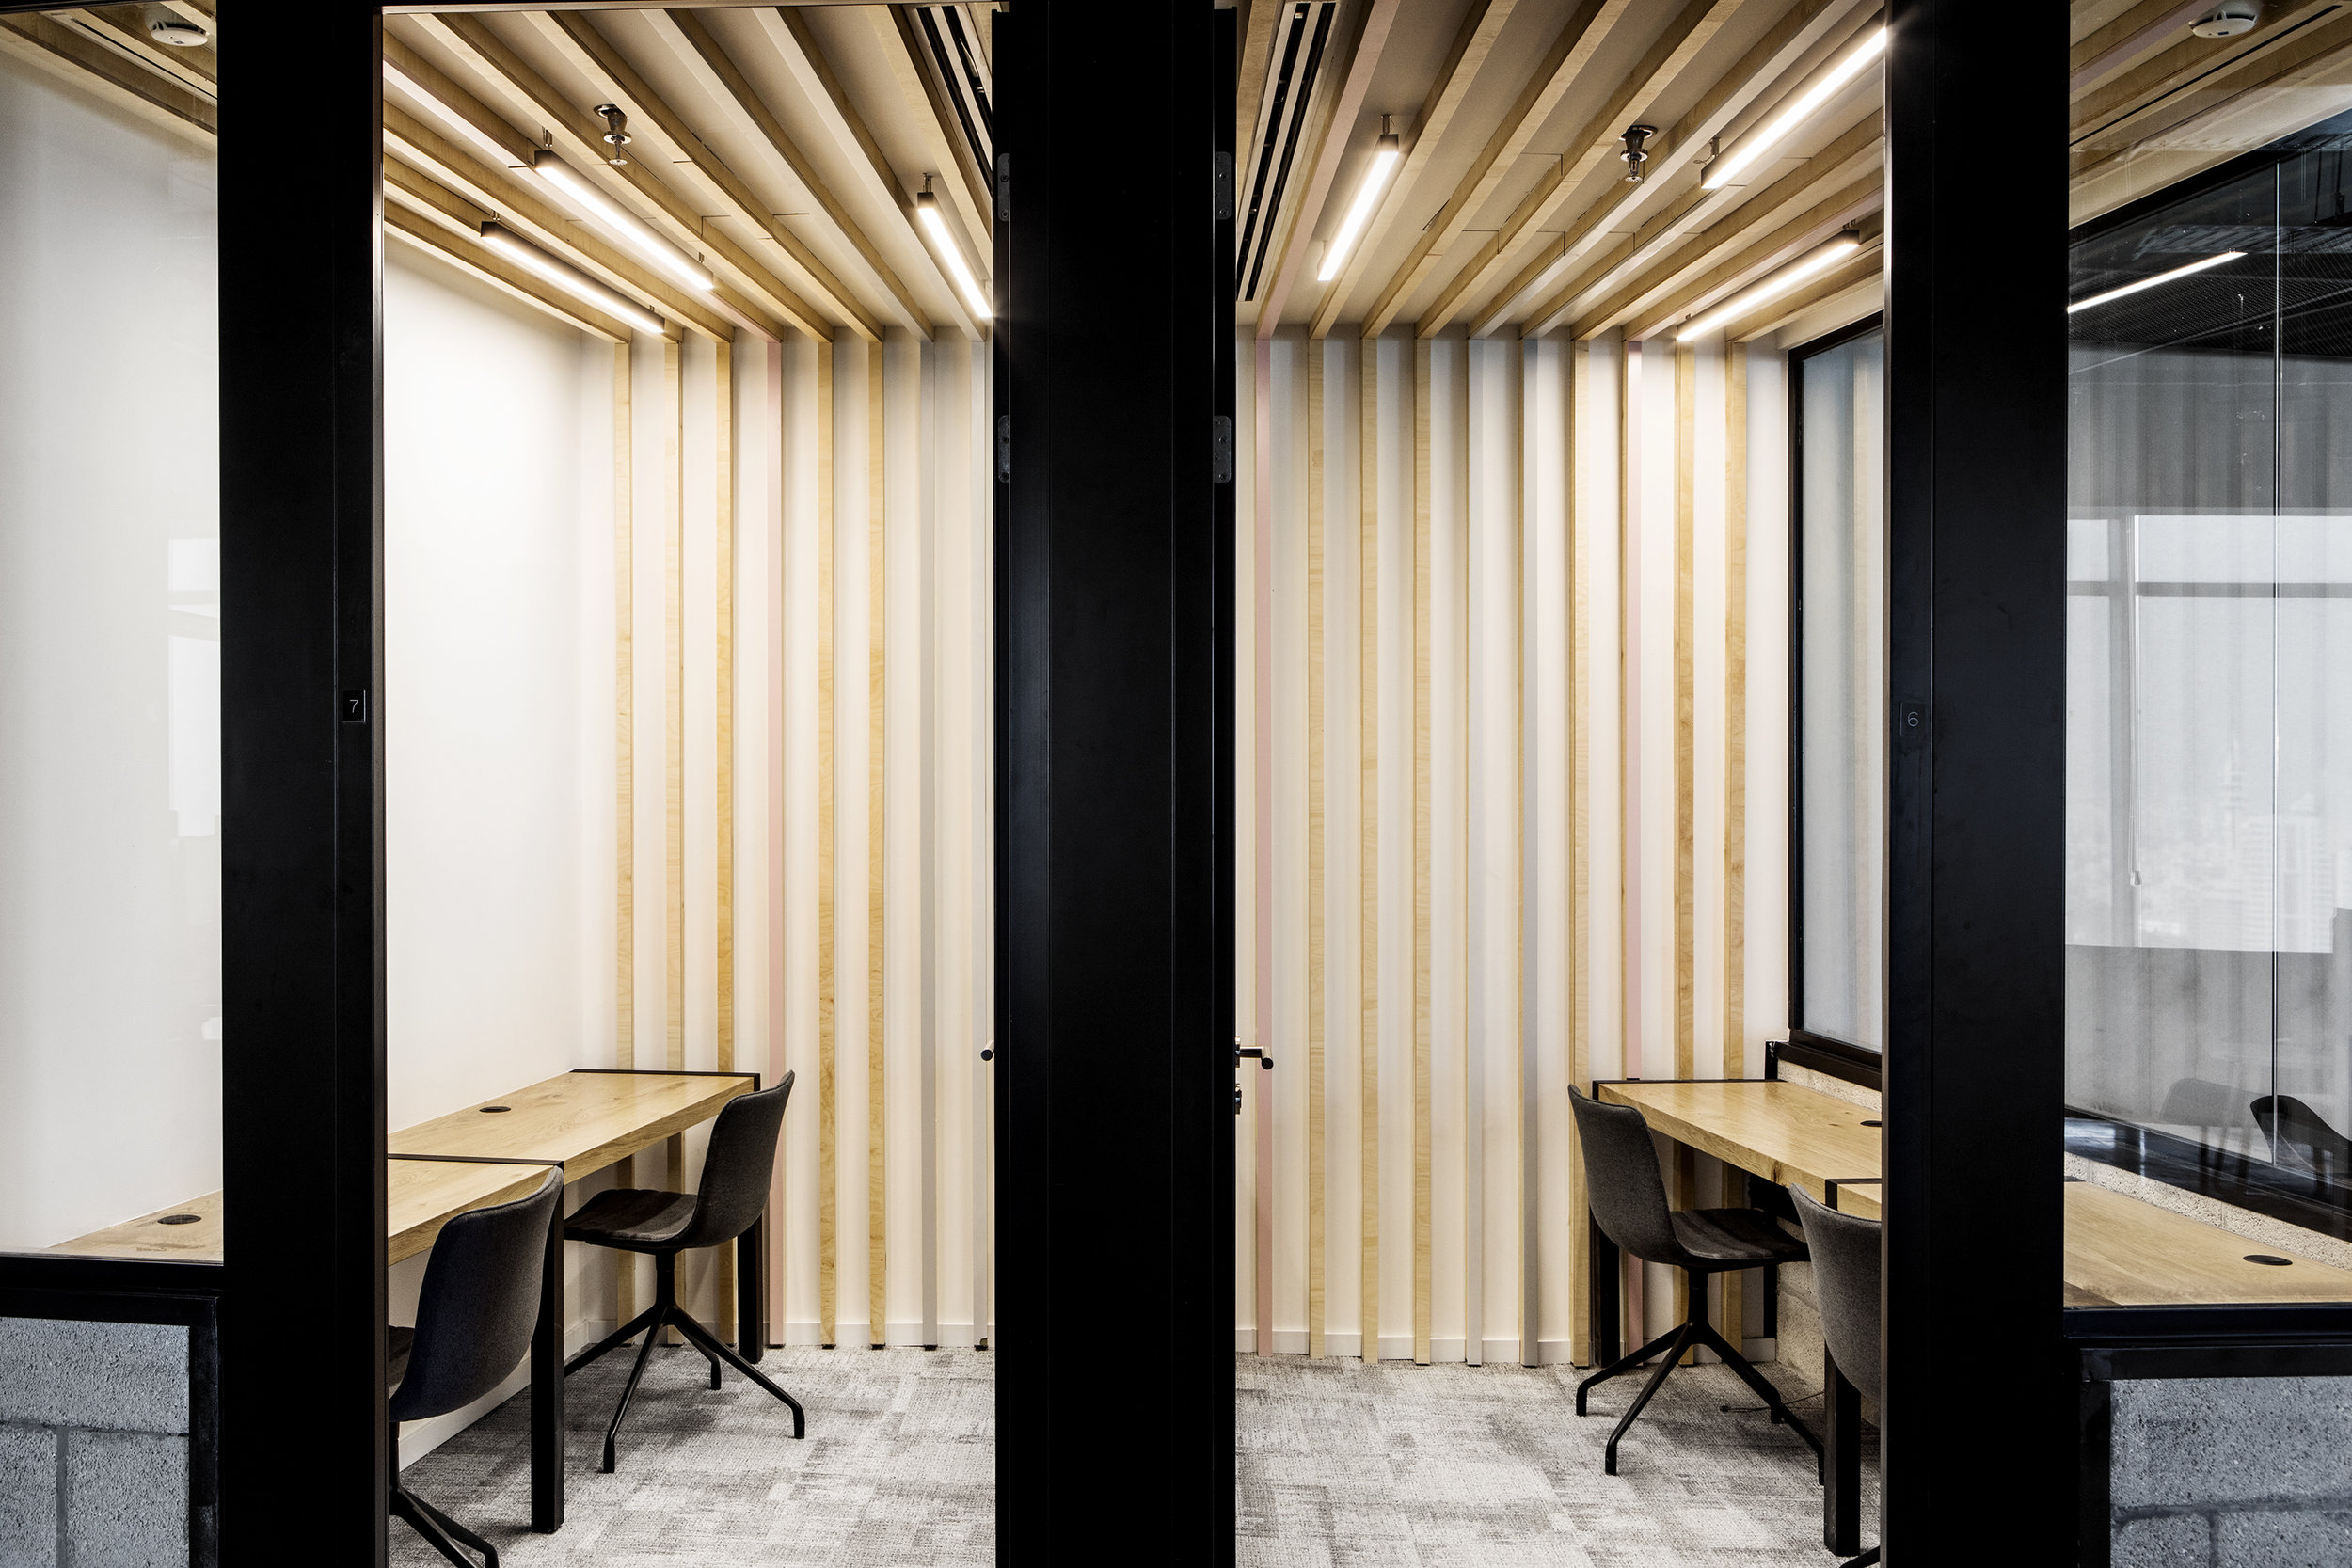 007_optimove - roy david architecture studio.jpg.jpg